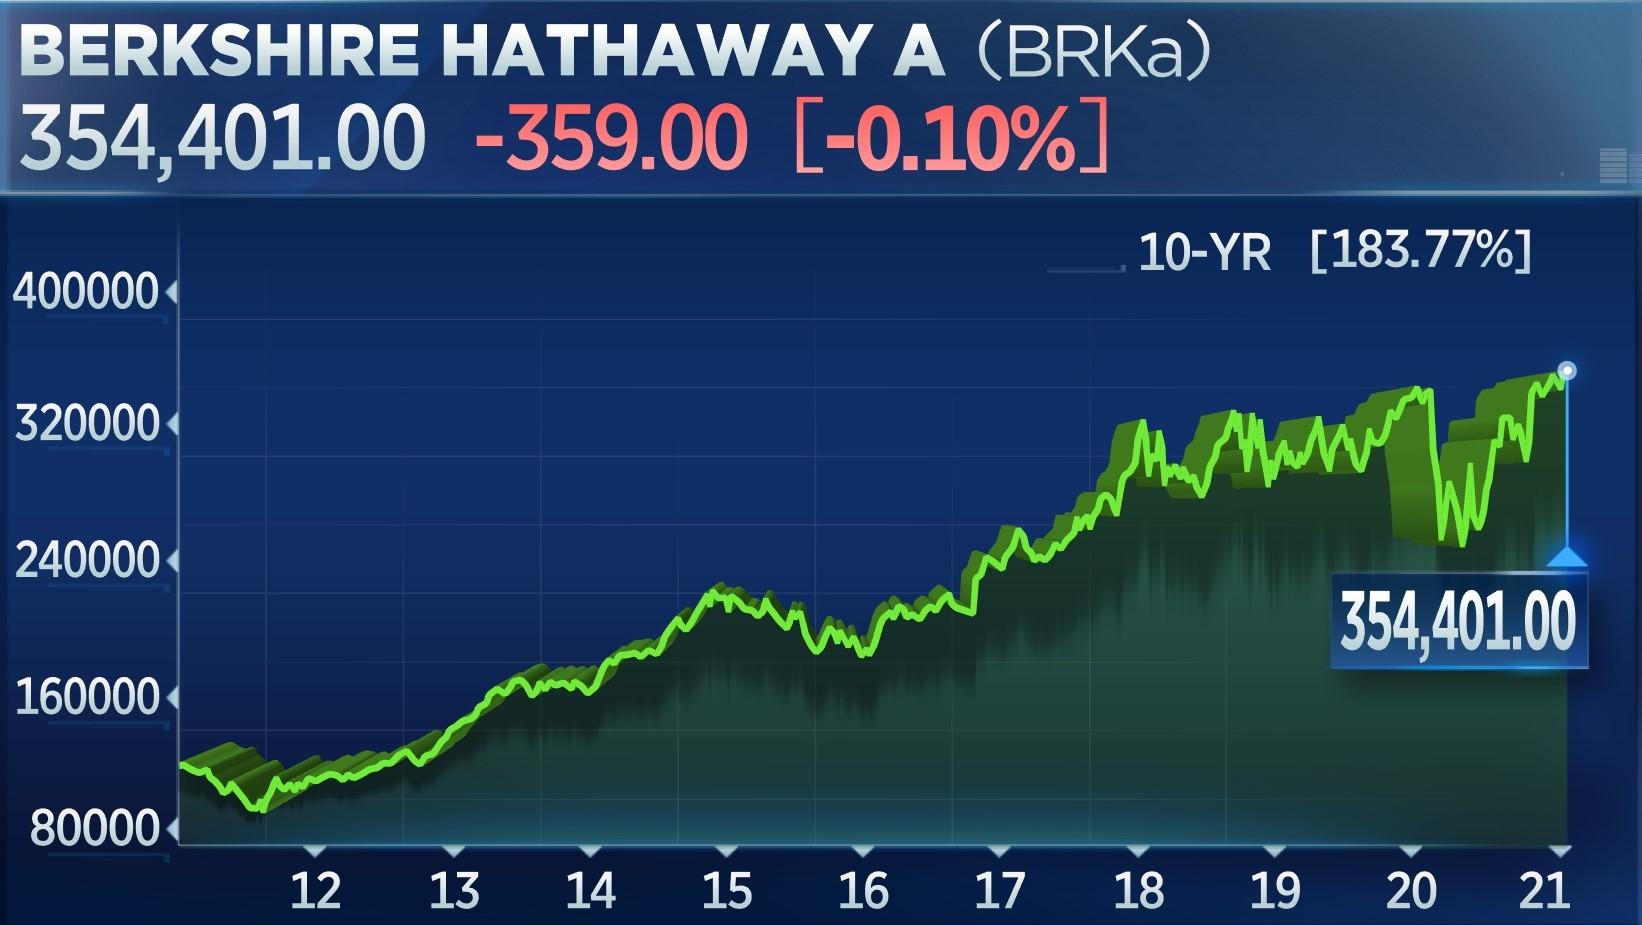 Berkshire Hathaway A 10-year chart